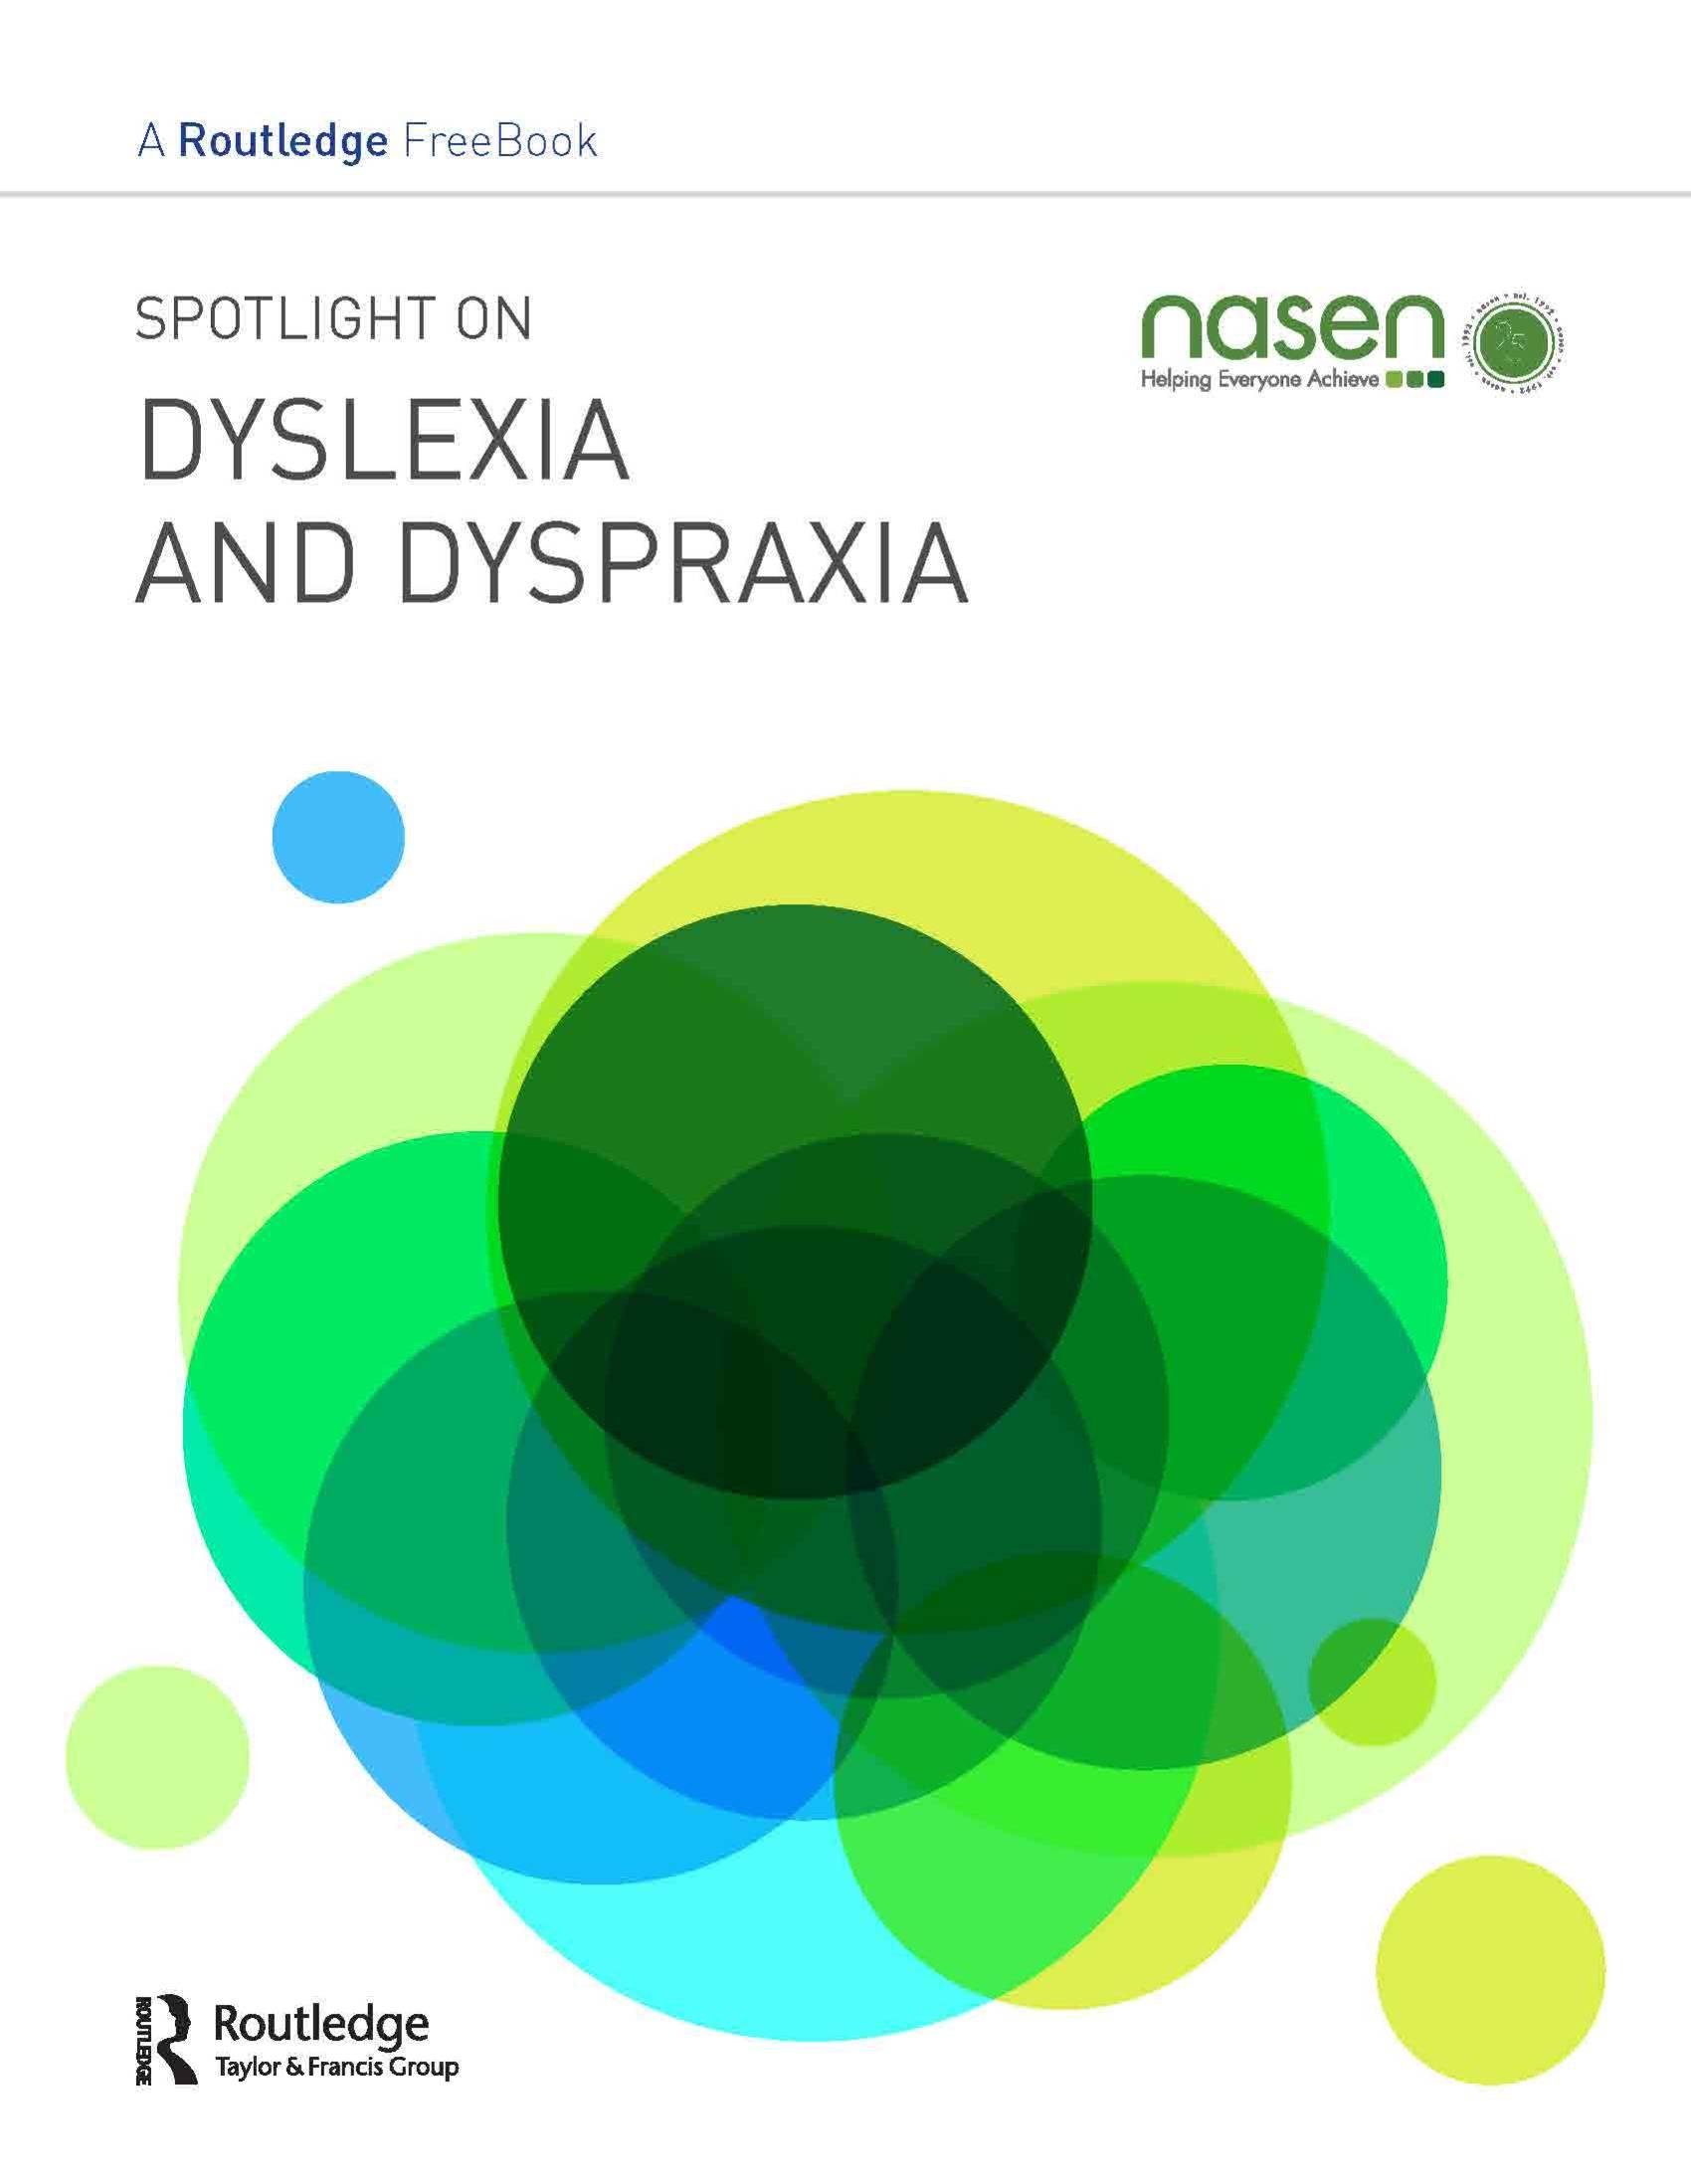 dyslexia and dyspraxia